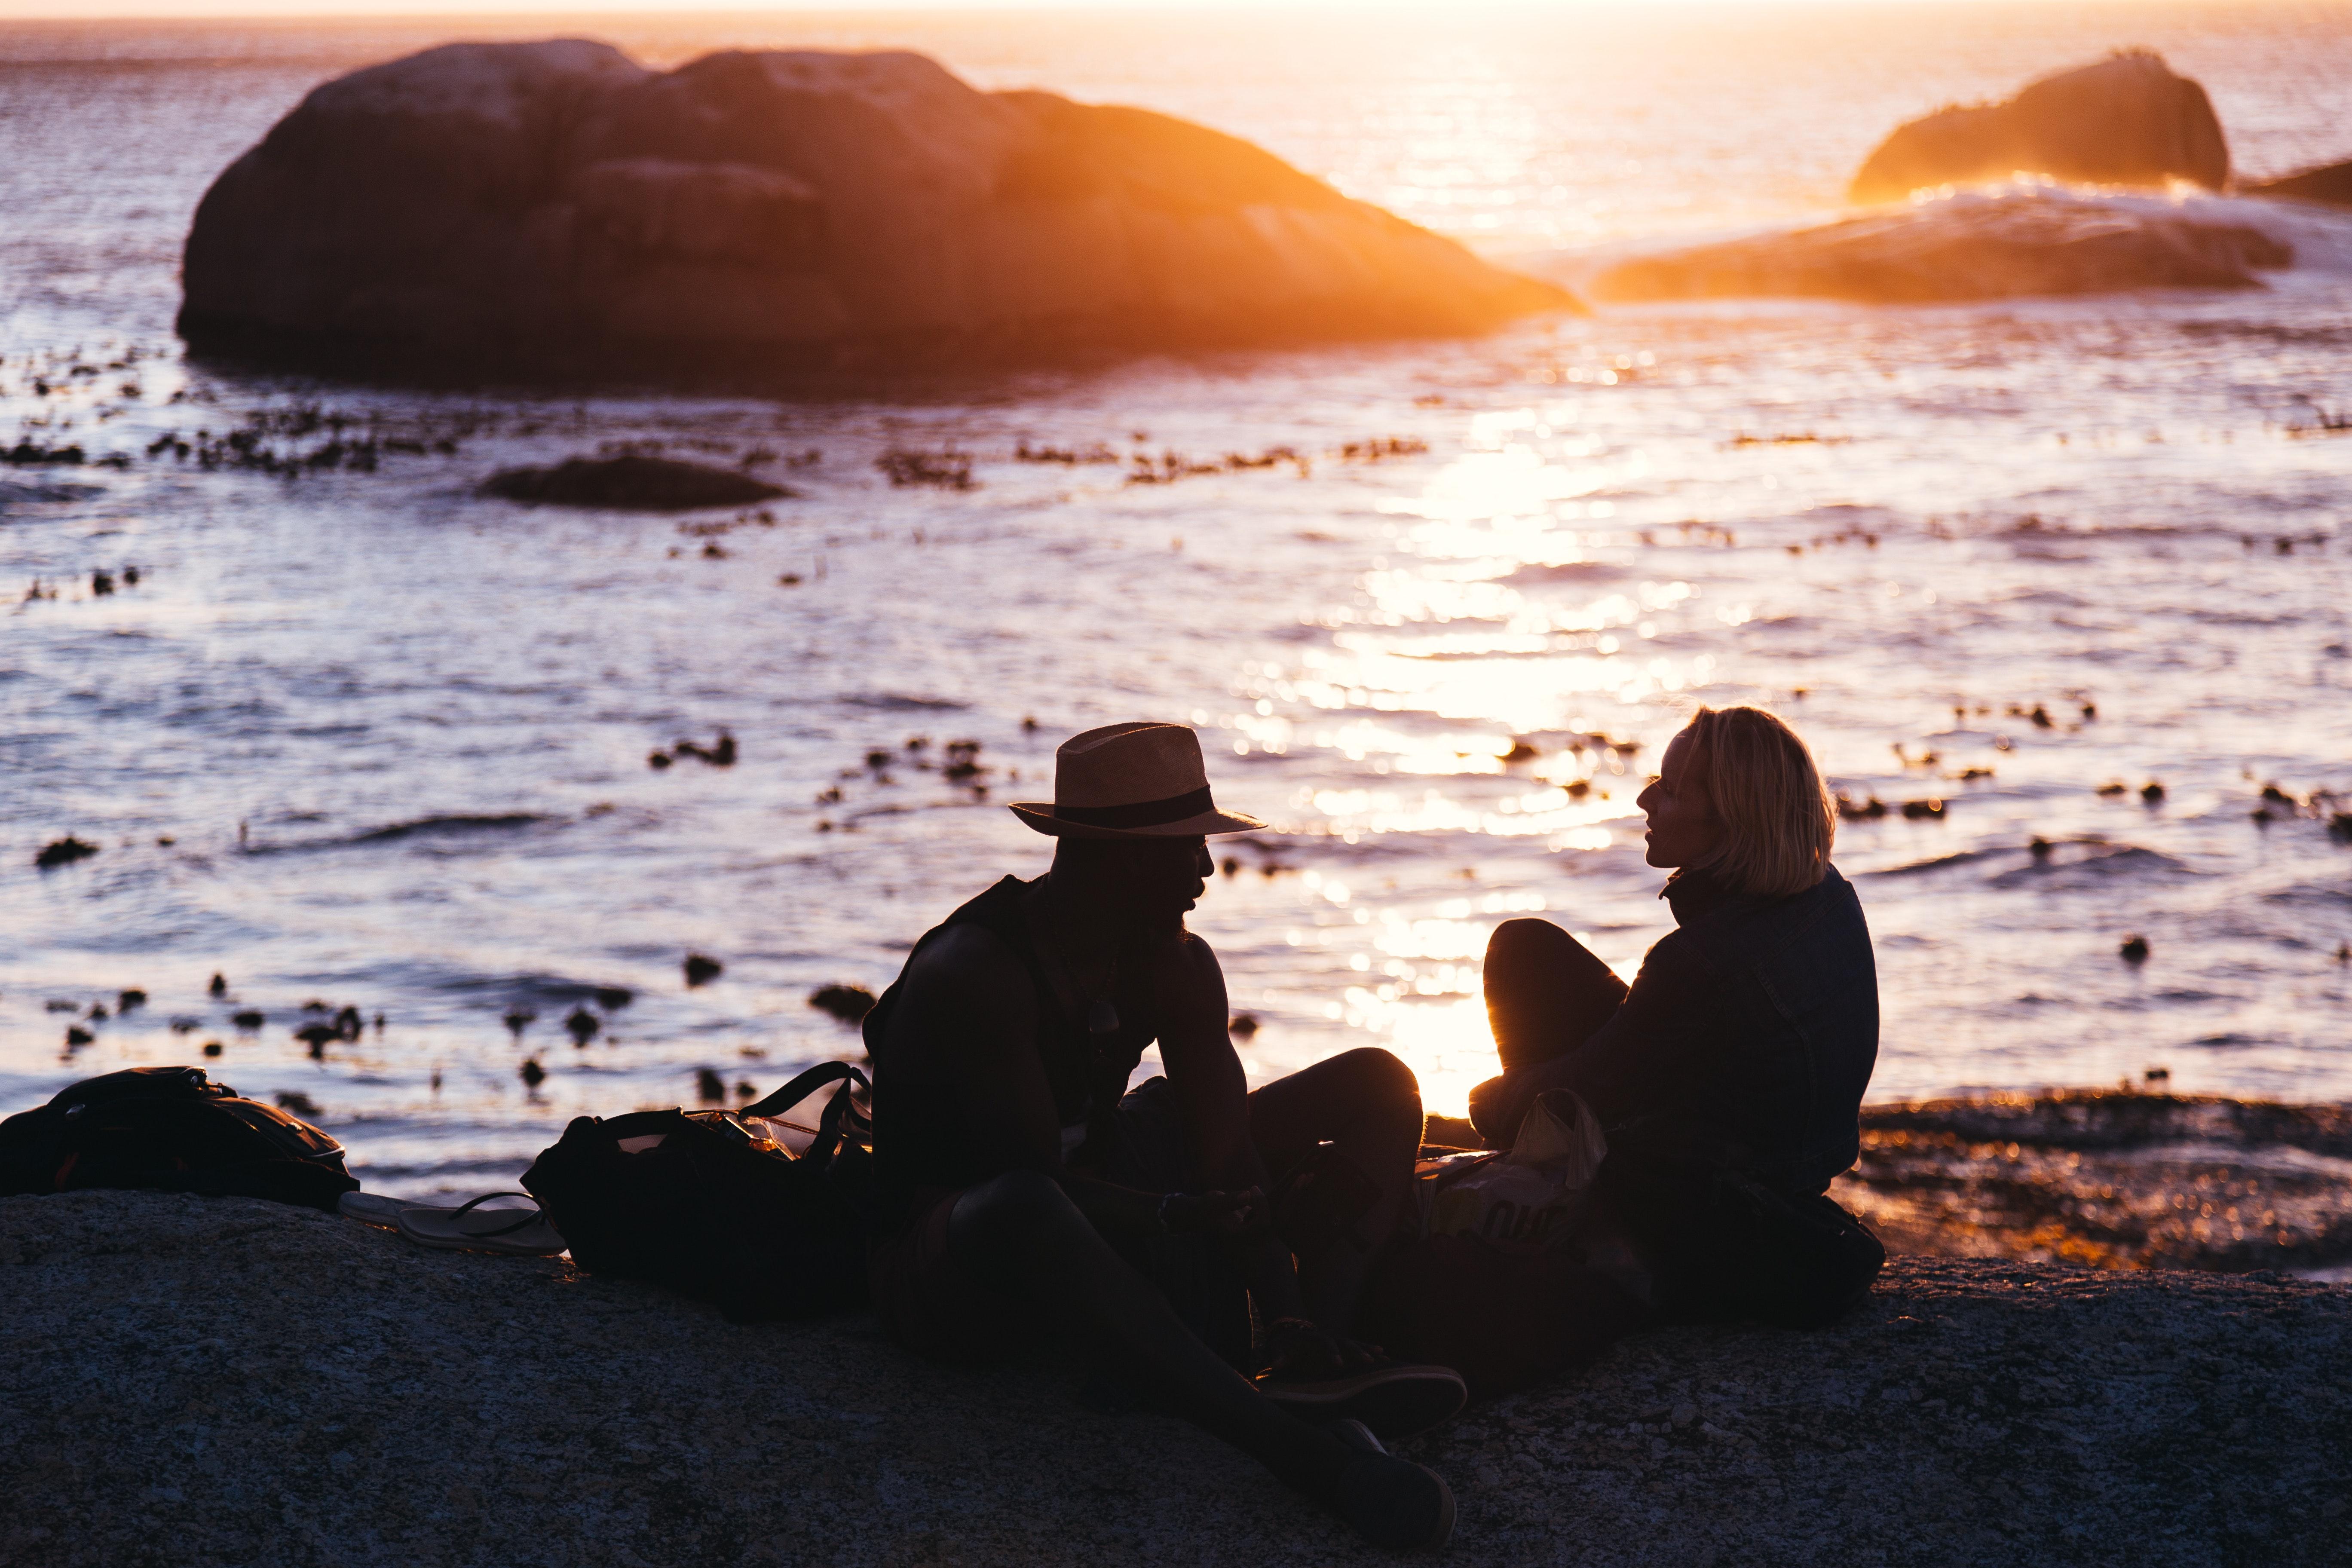 affection-beach-couple-1330808